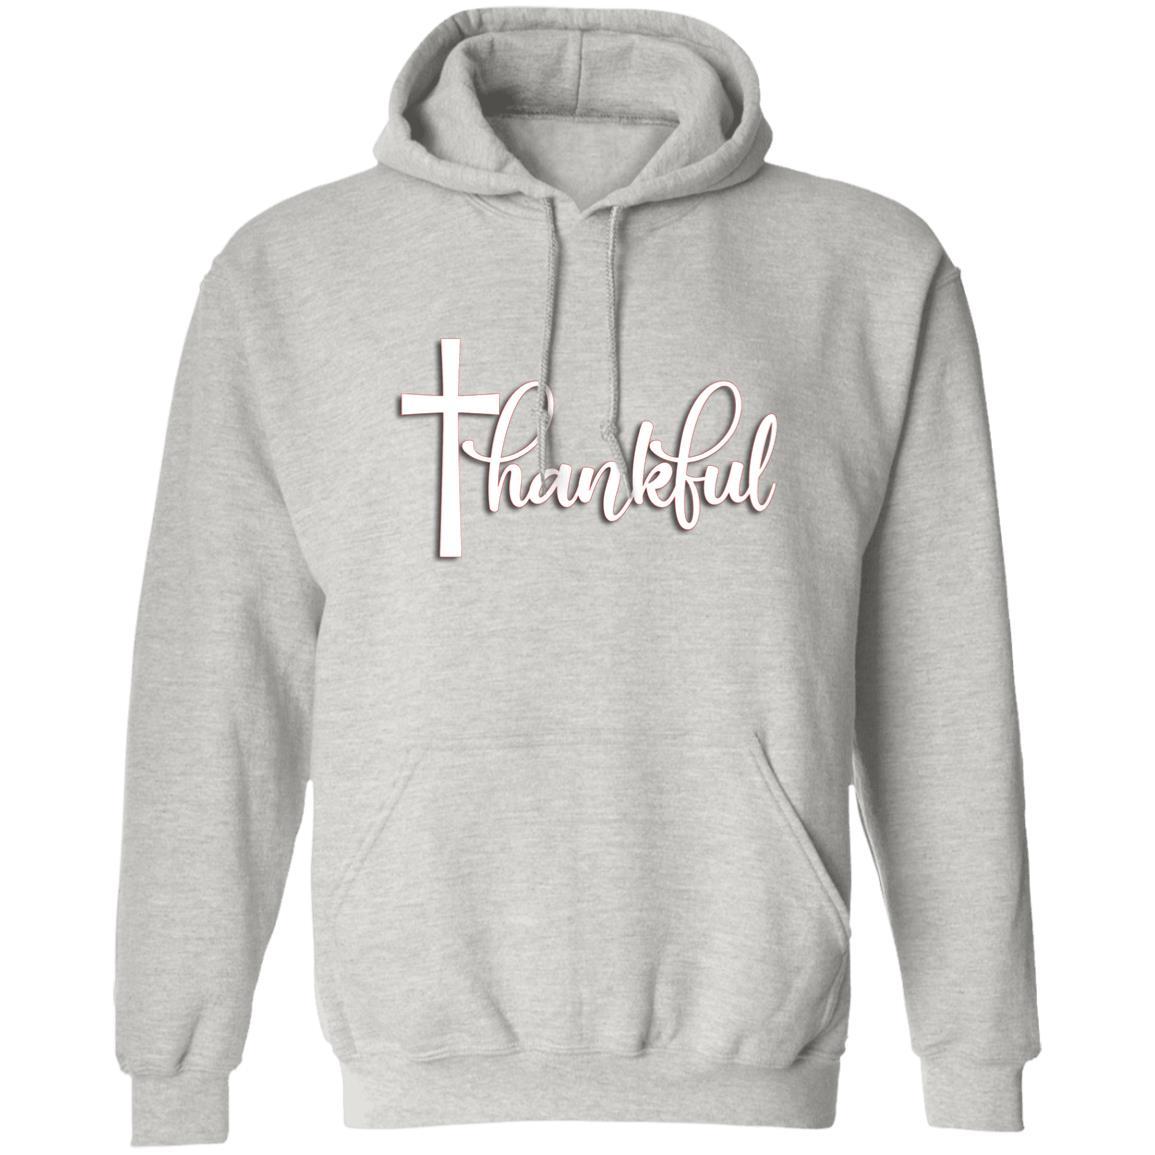 Thankful Pullover Unisex Hoodie